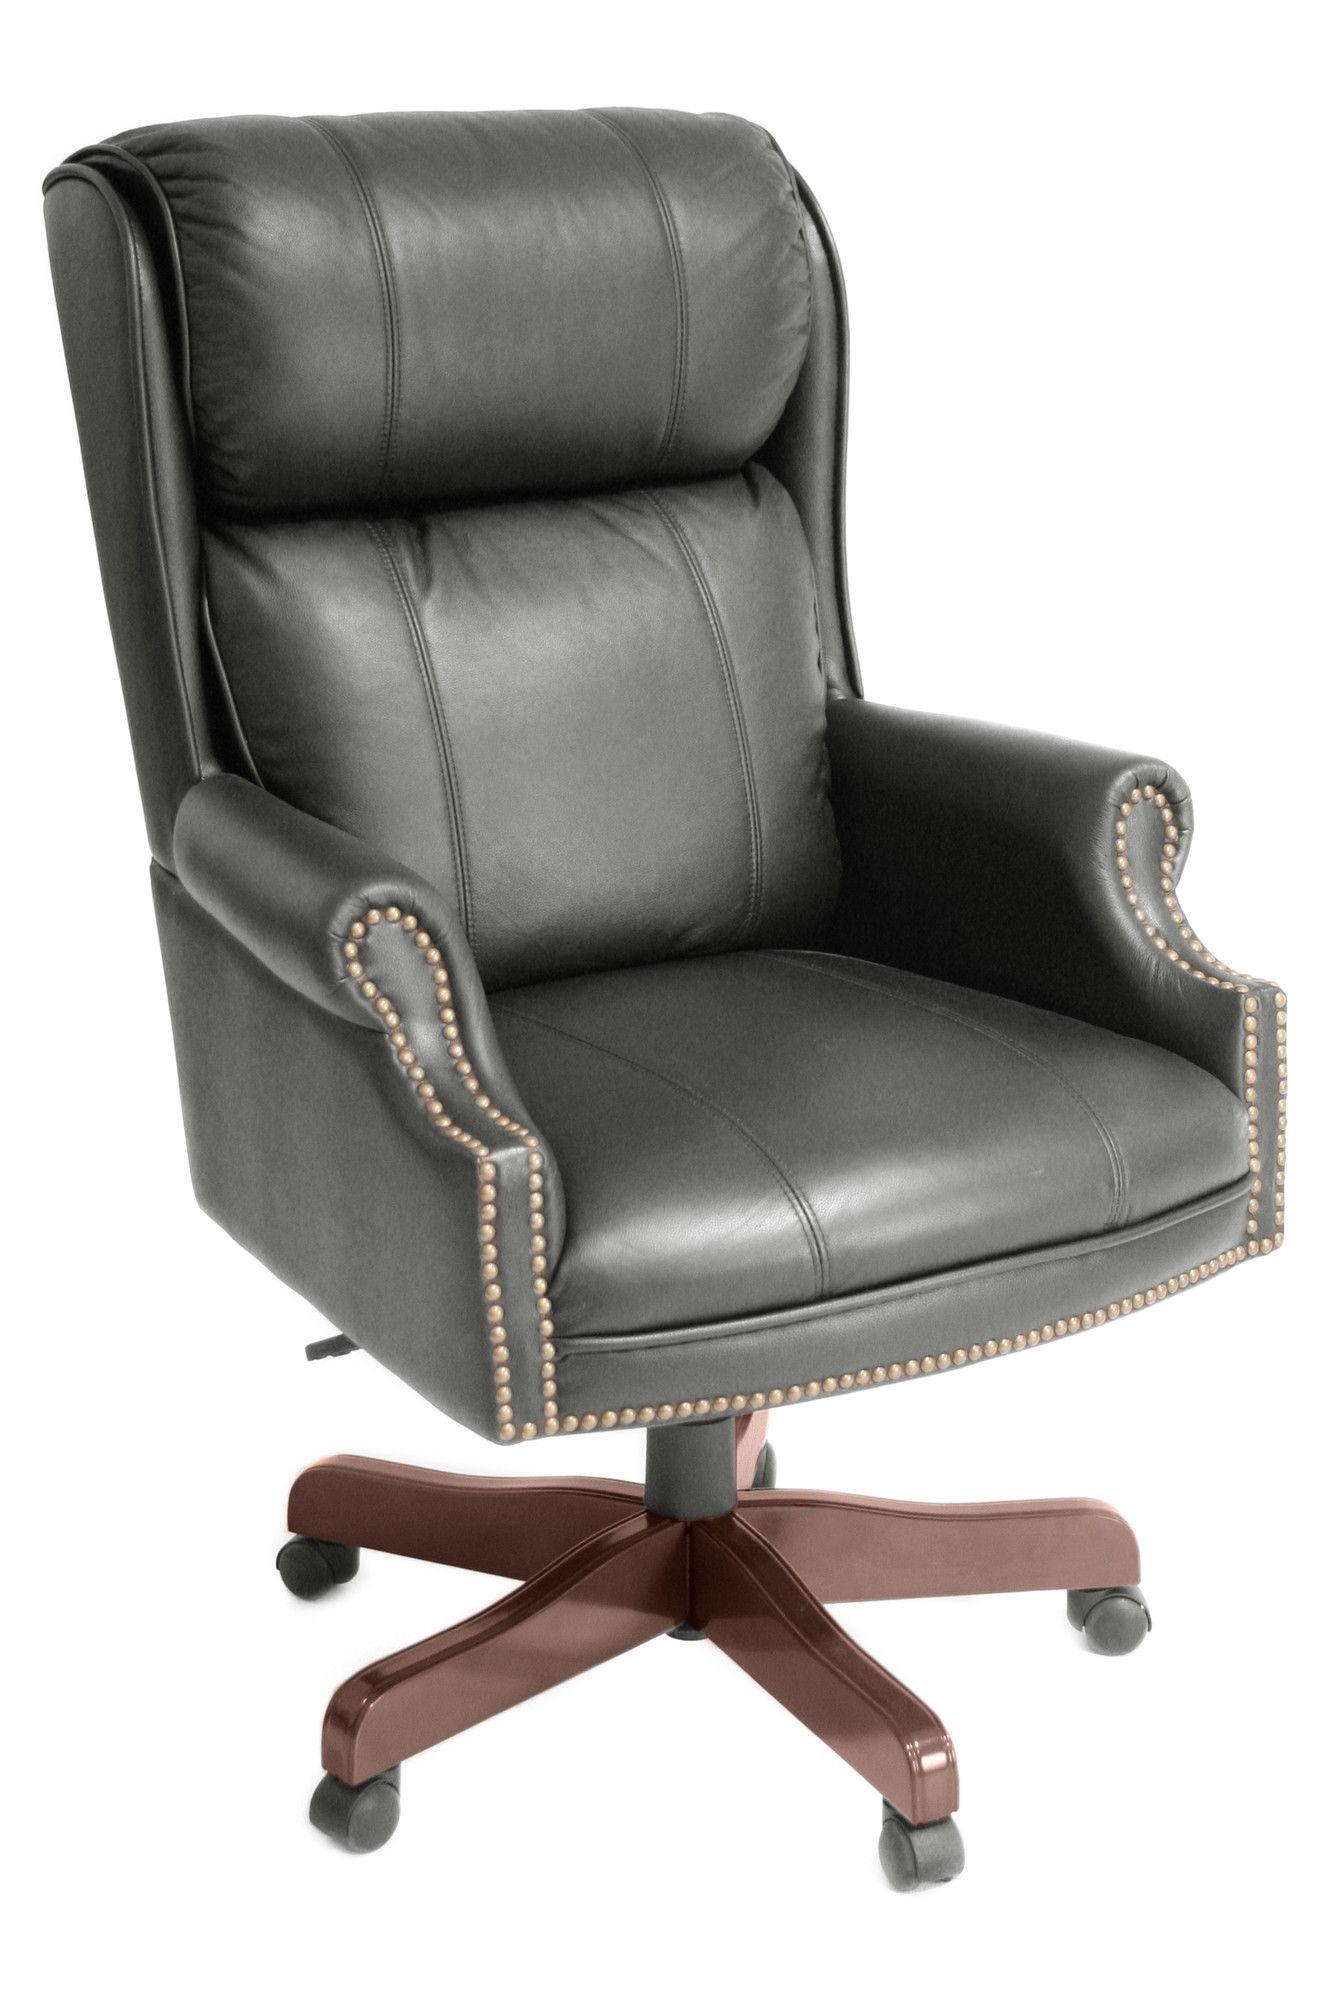 Ivy League High Back Leather Executive Chair